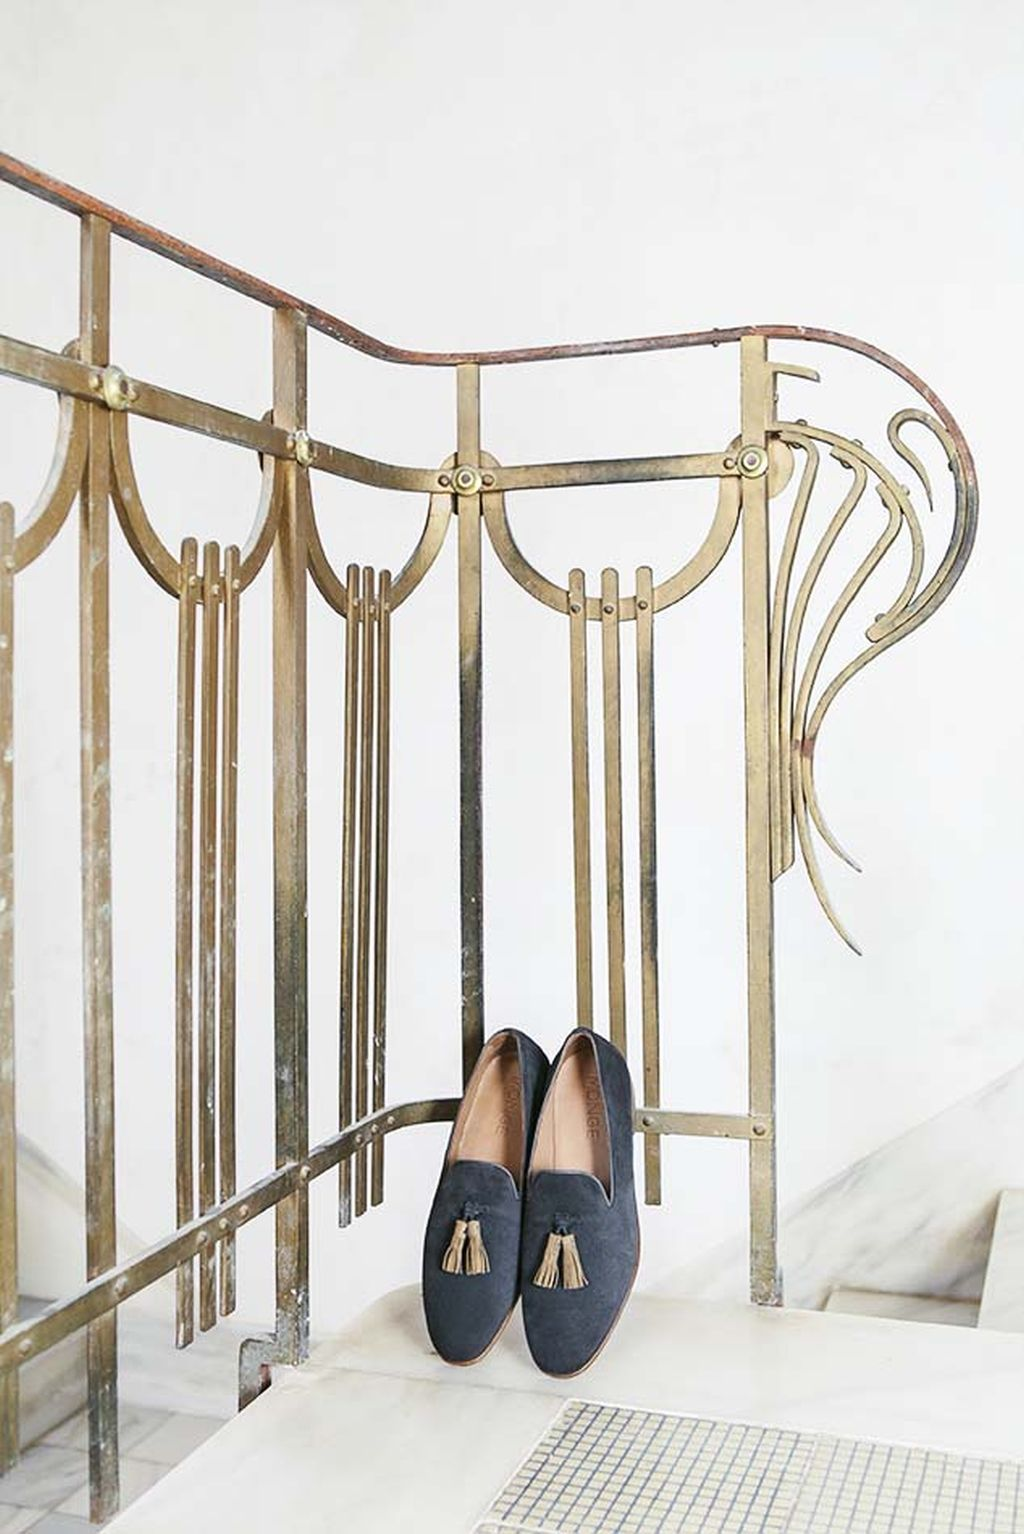 Monge – bespoke loafers